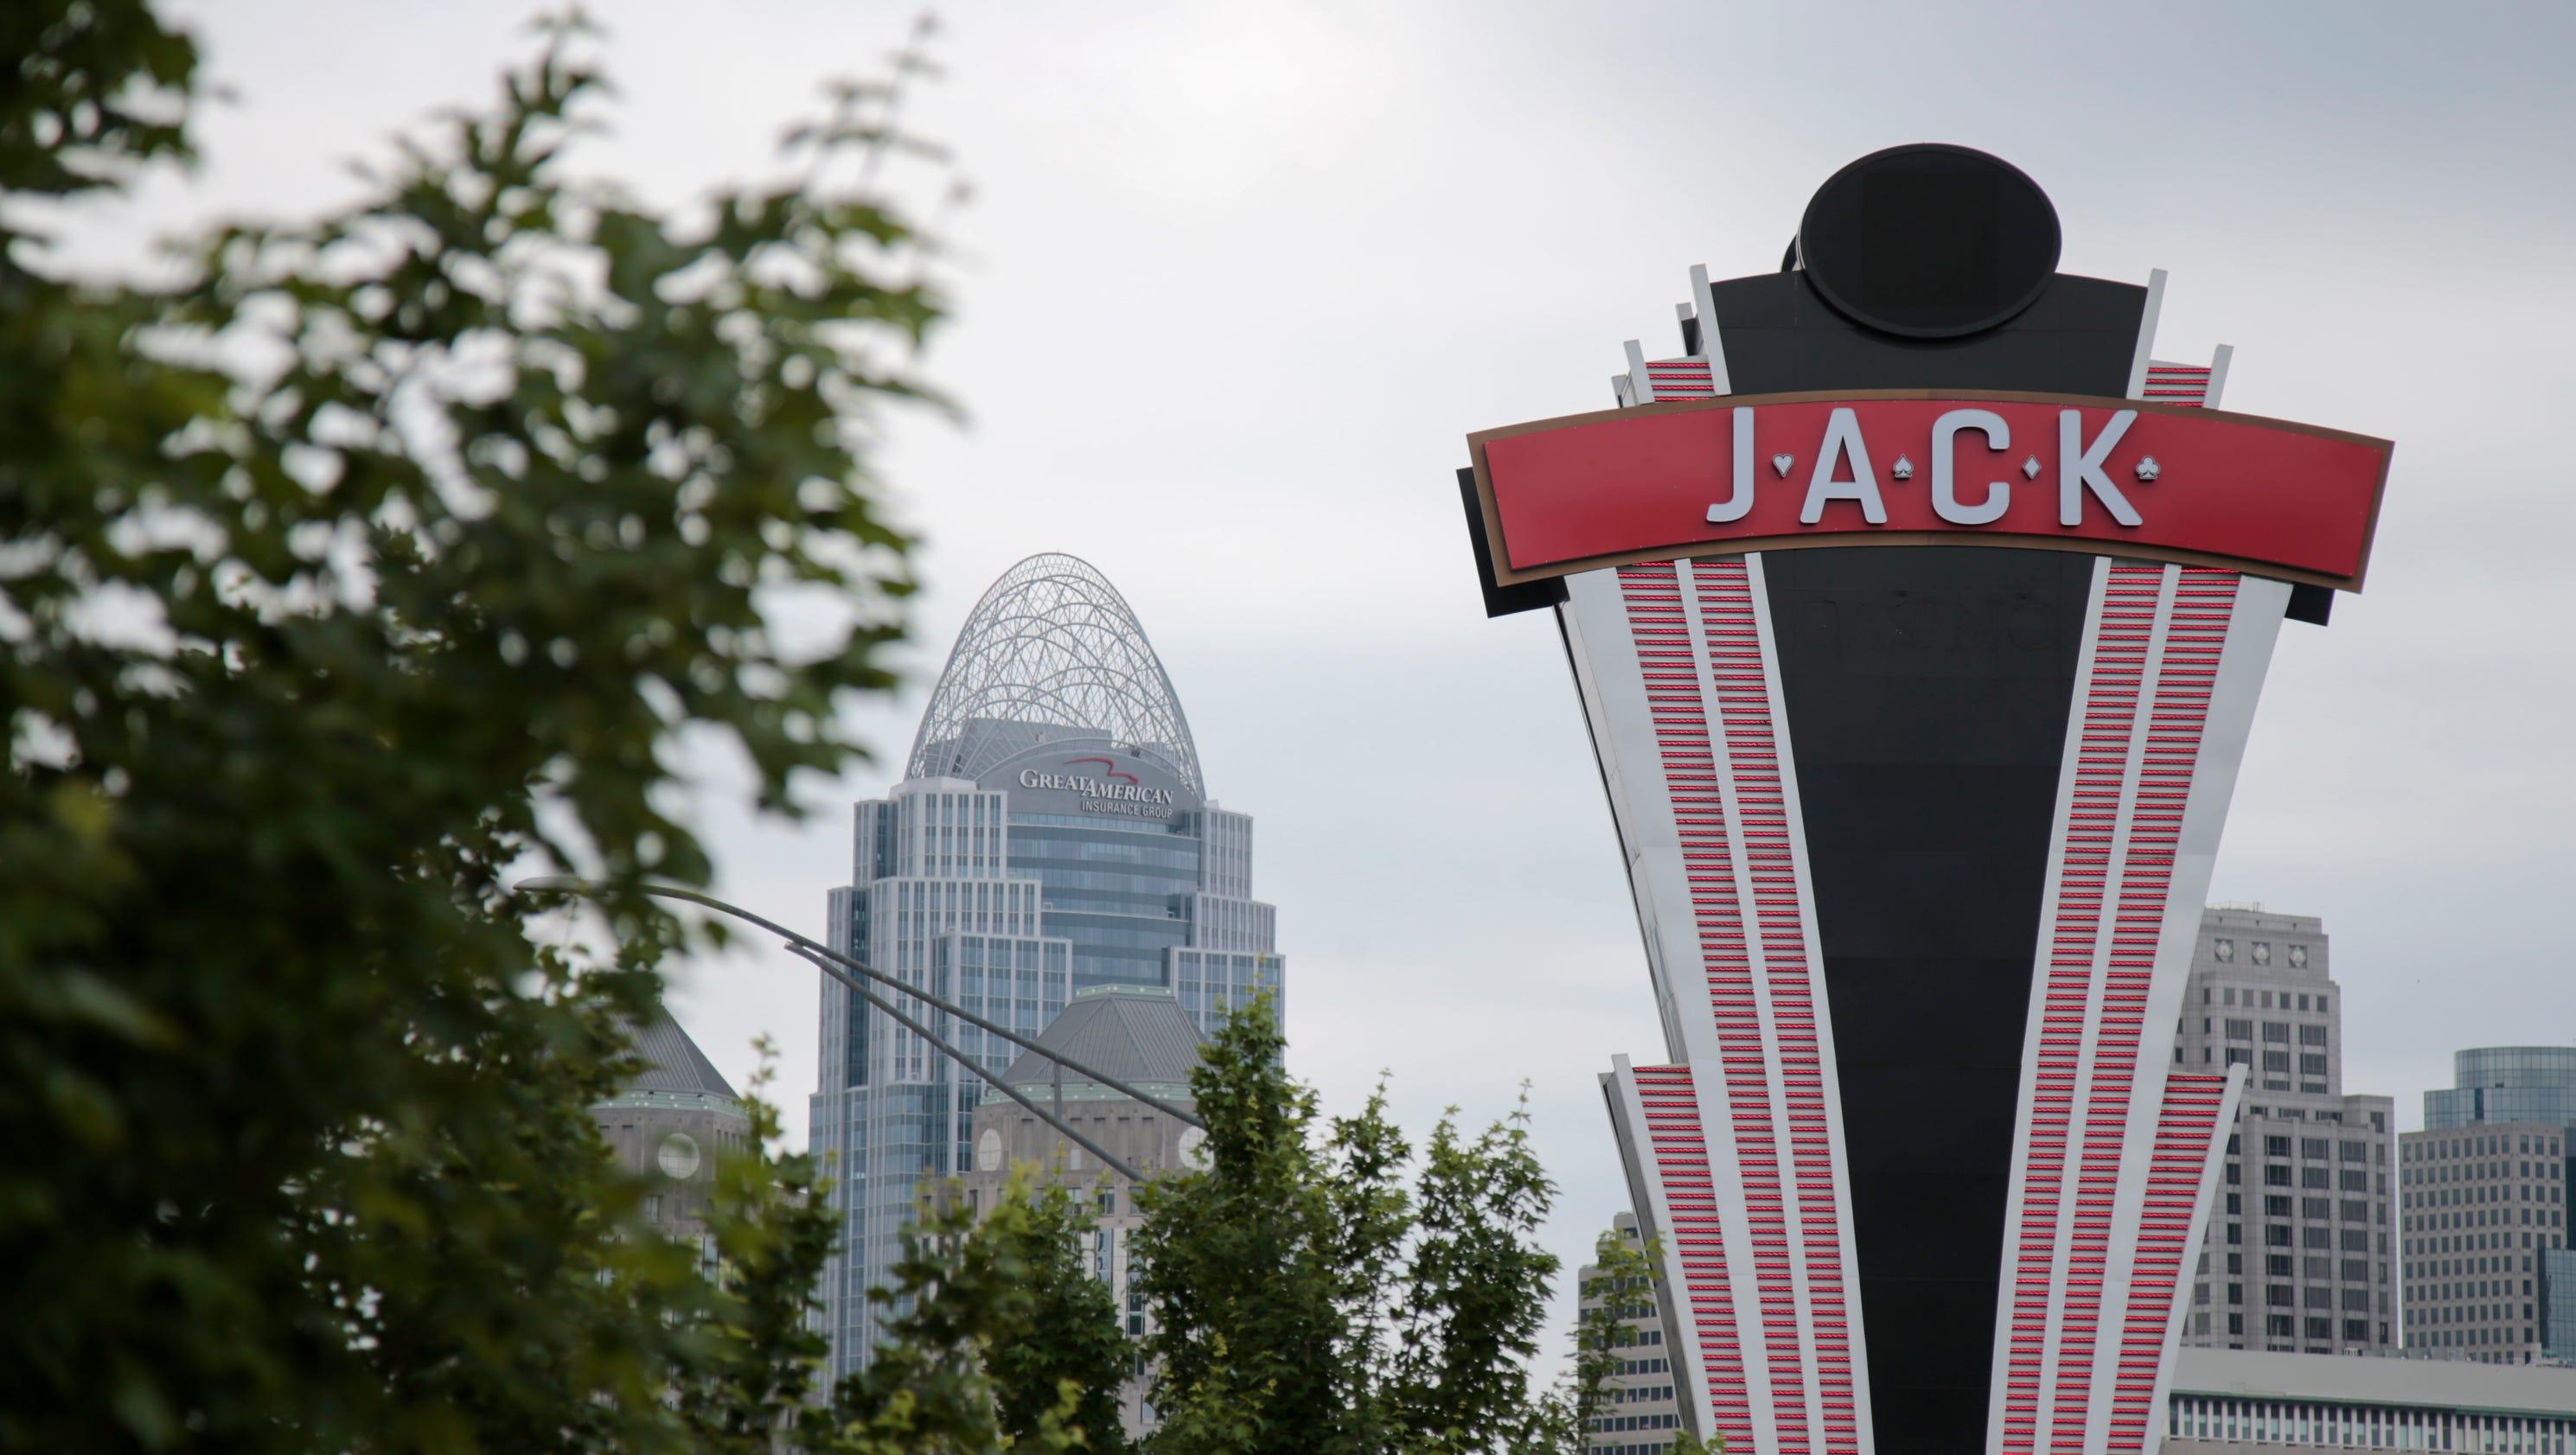 Casino jack plot